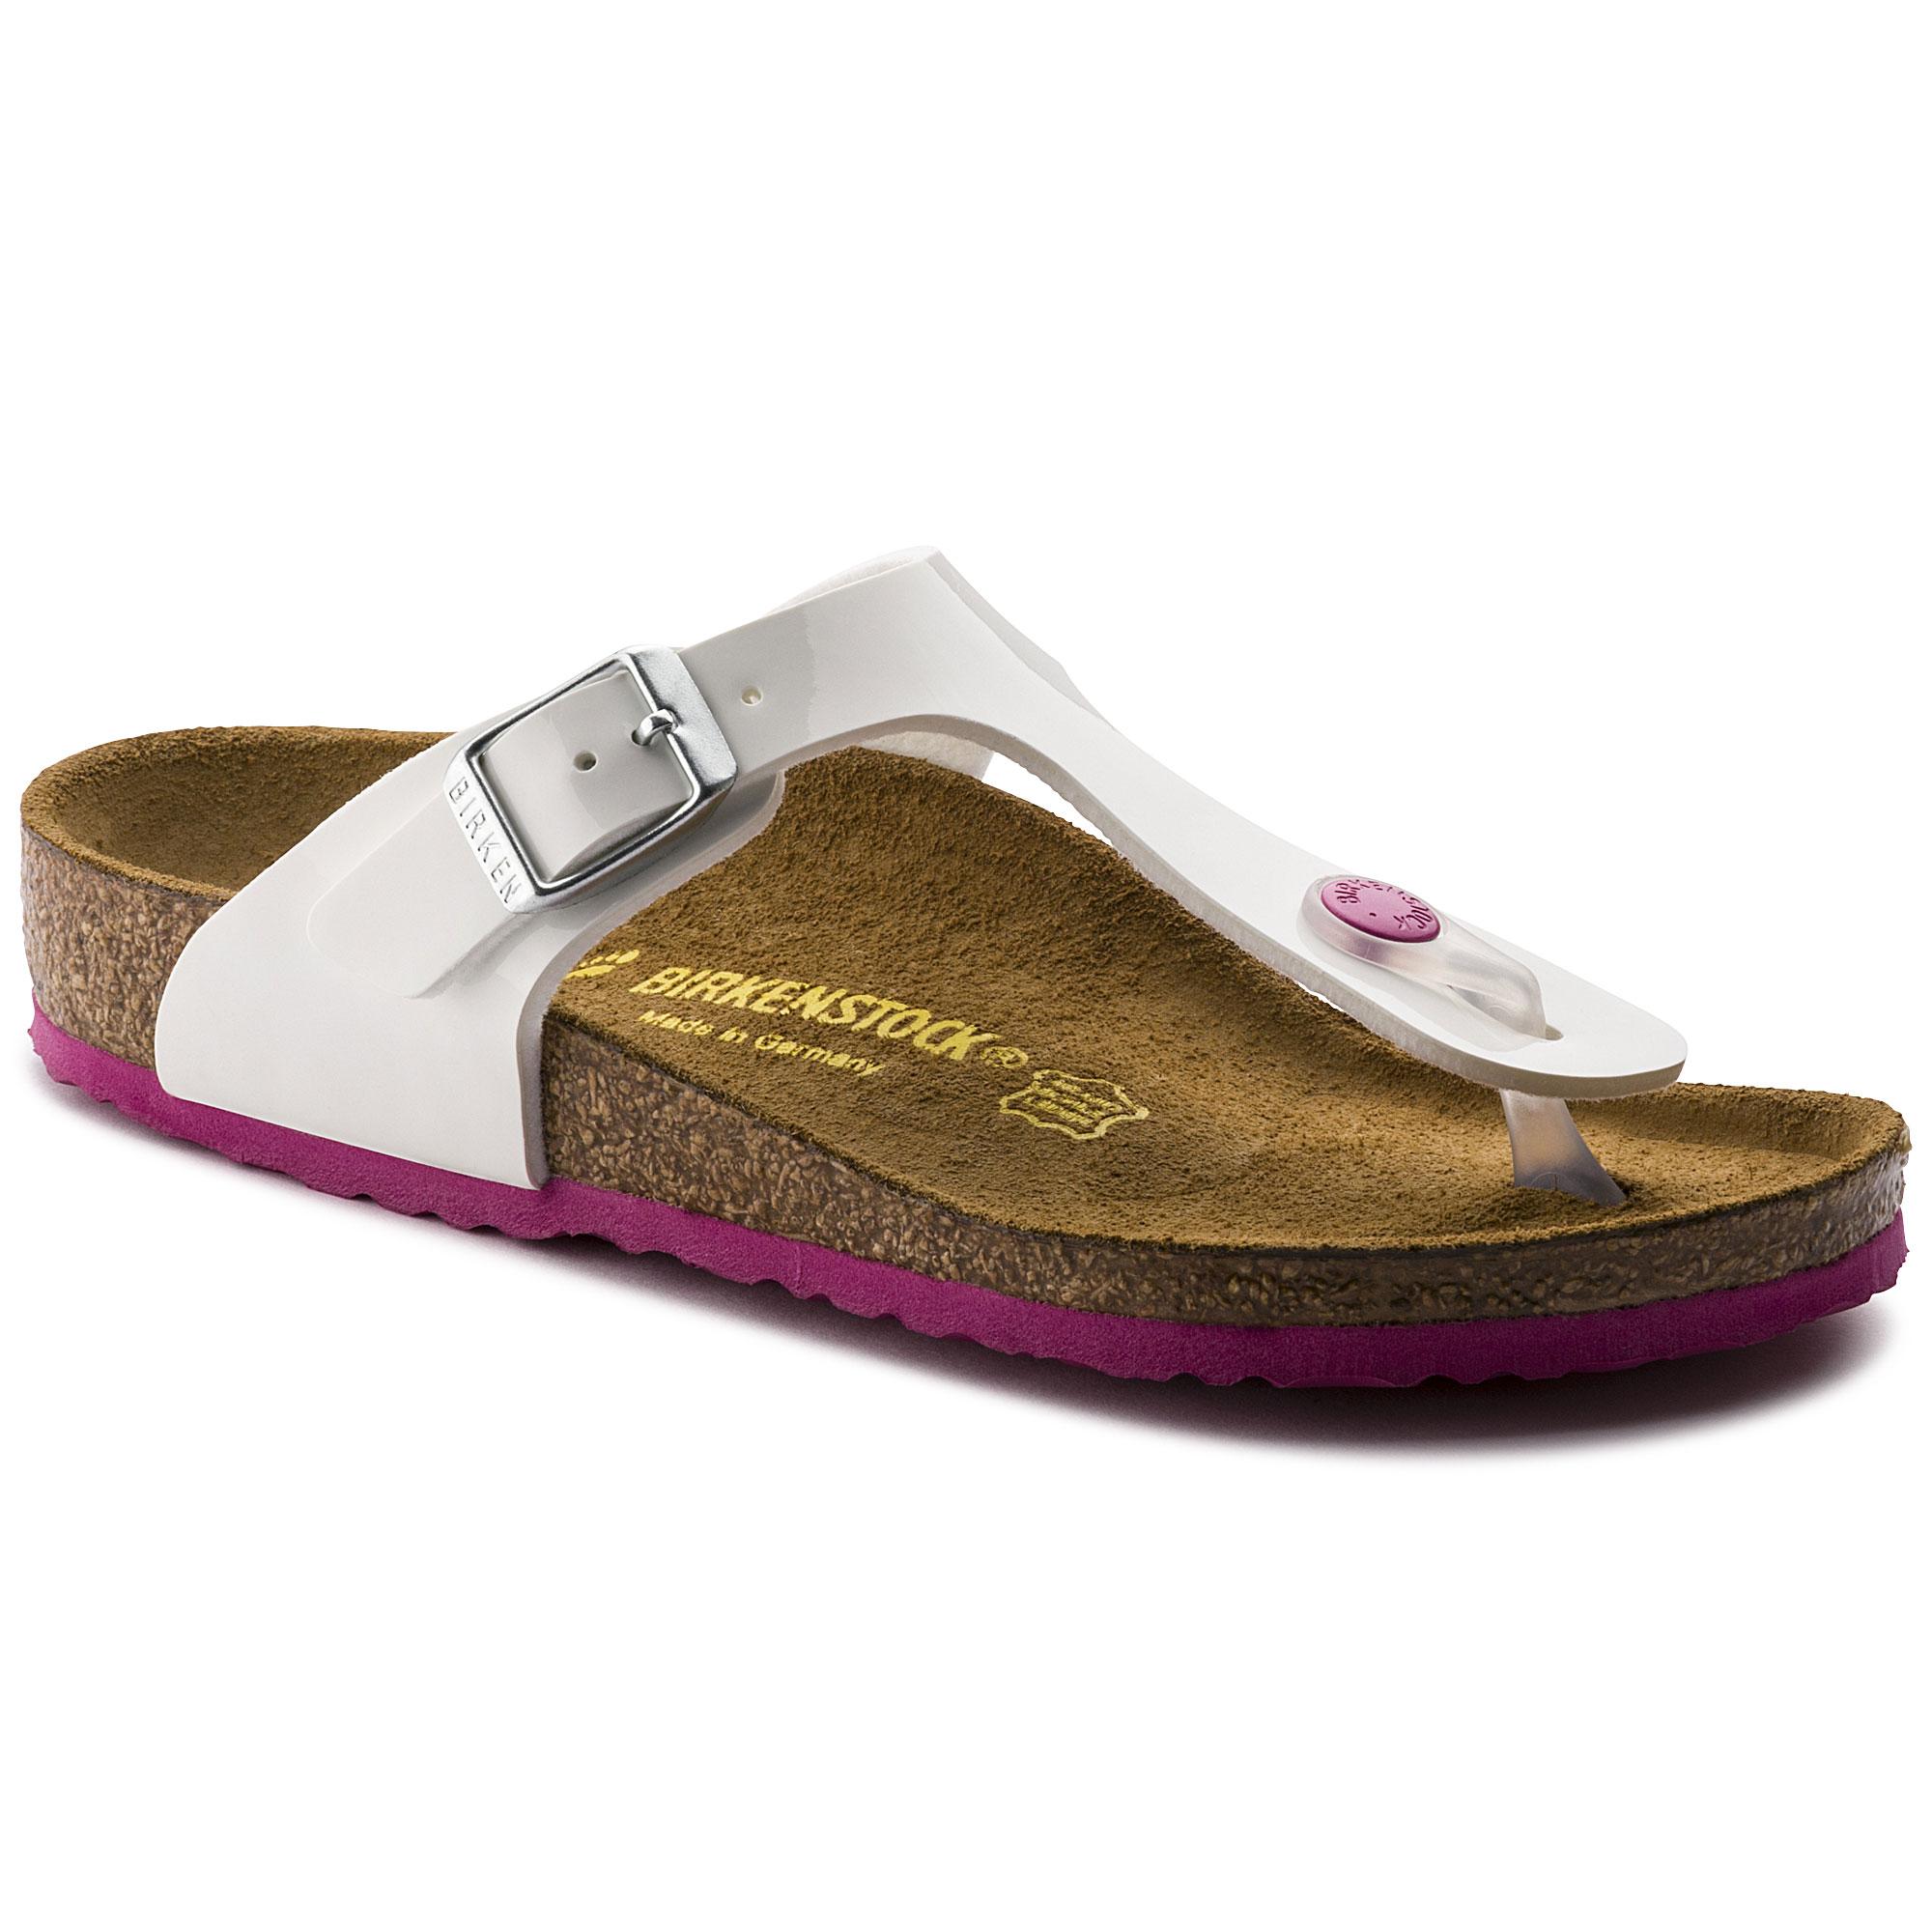 Birkenstock Zapatos Destalonados MadridBirko-Flor®Violeta fu2H0Rymq